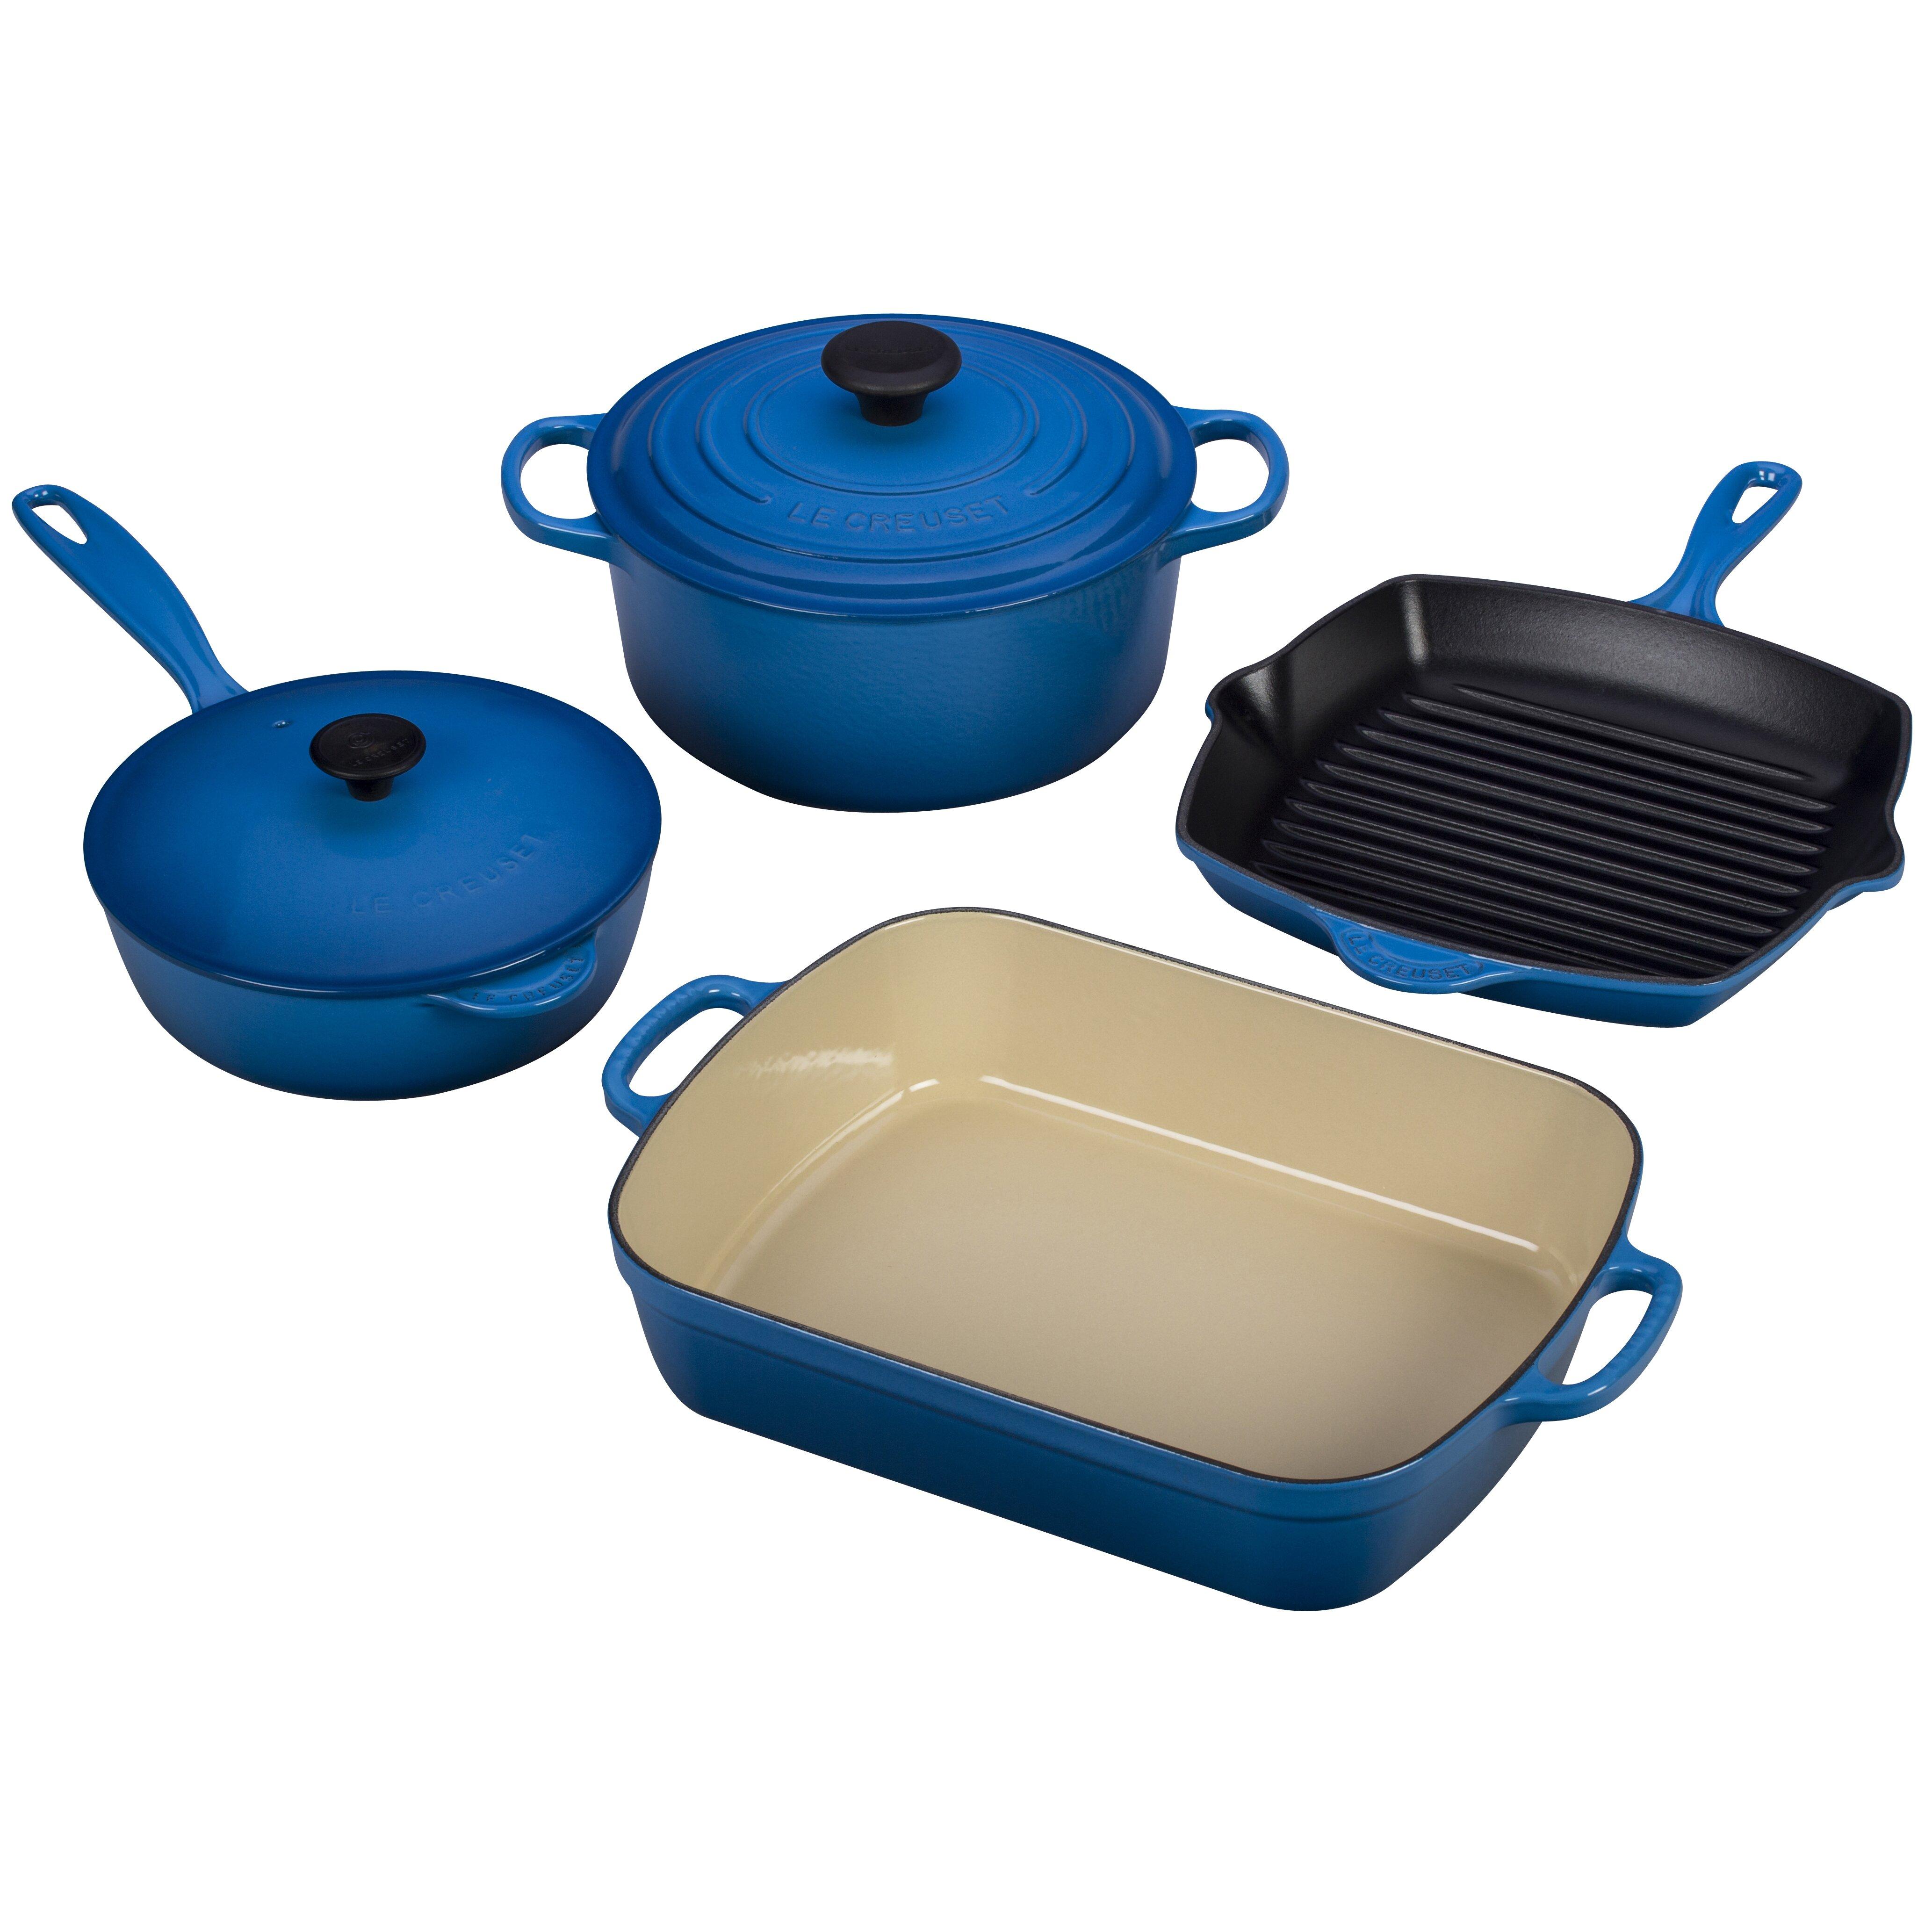 Le creuset cast iron saucepan set - Le Creuset Cast Iron Signature 6 Piece Cookware Set